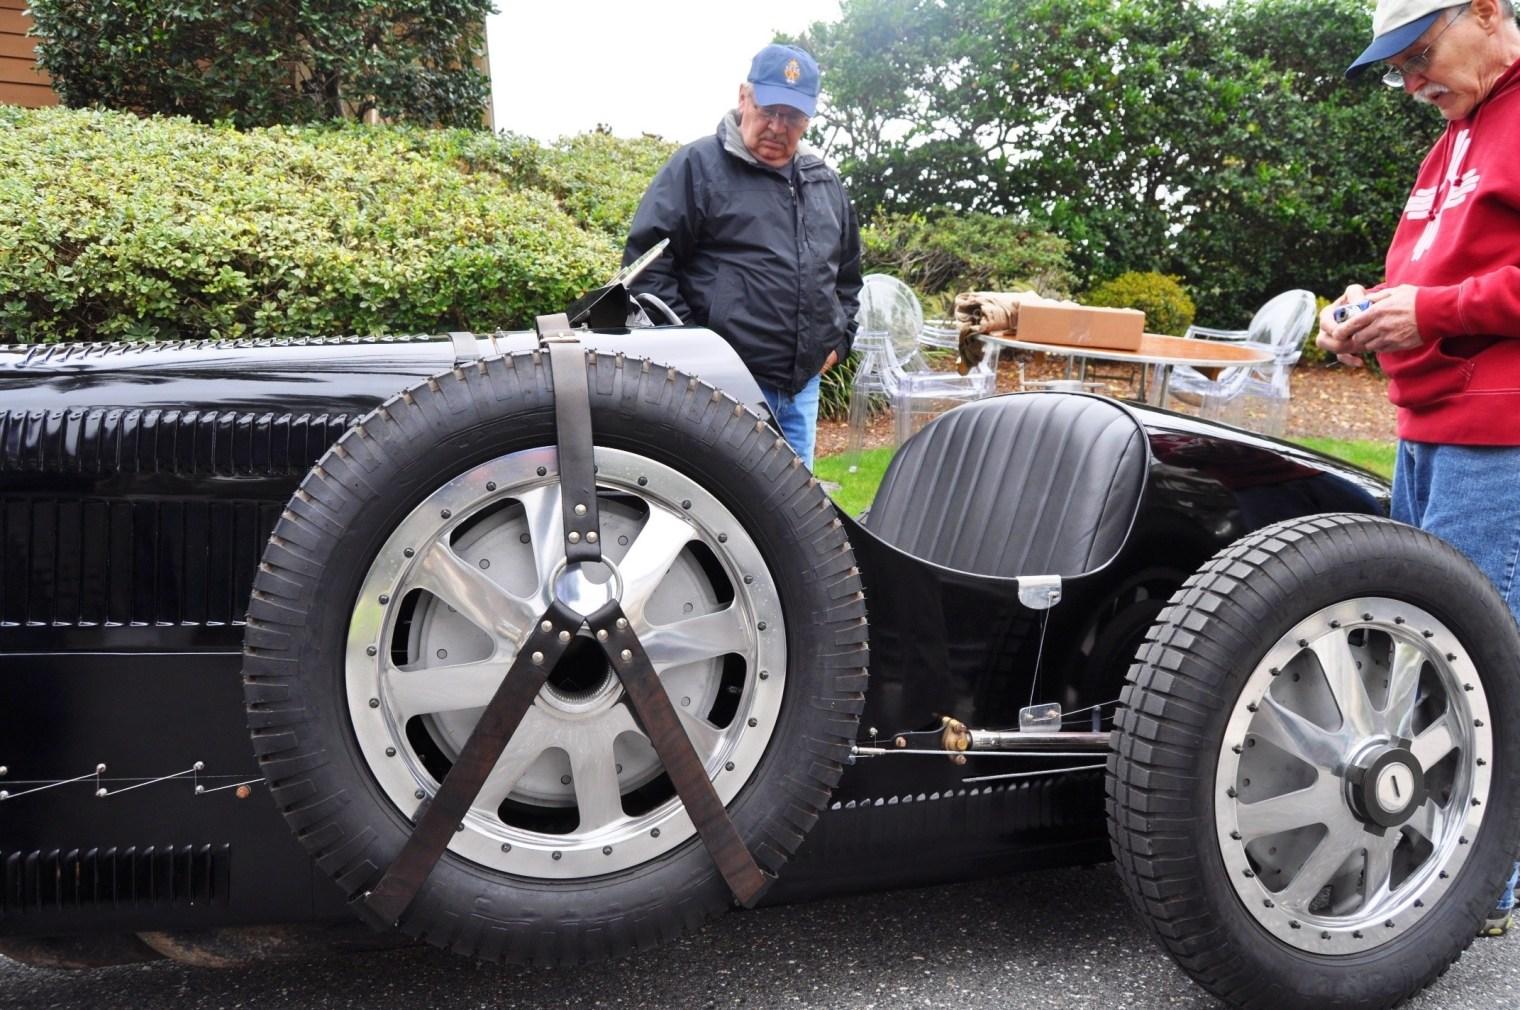 PurSang Argentina Shows Innovative Marketing with Street-Parked 1920s Bugatti GP Car10